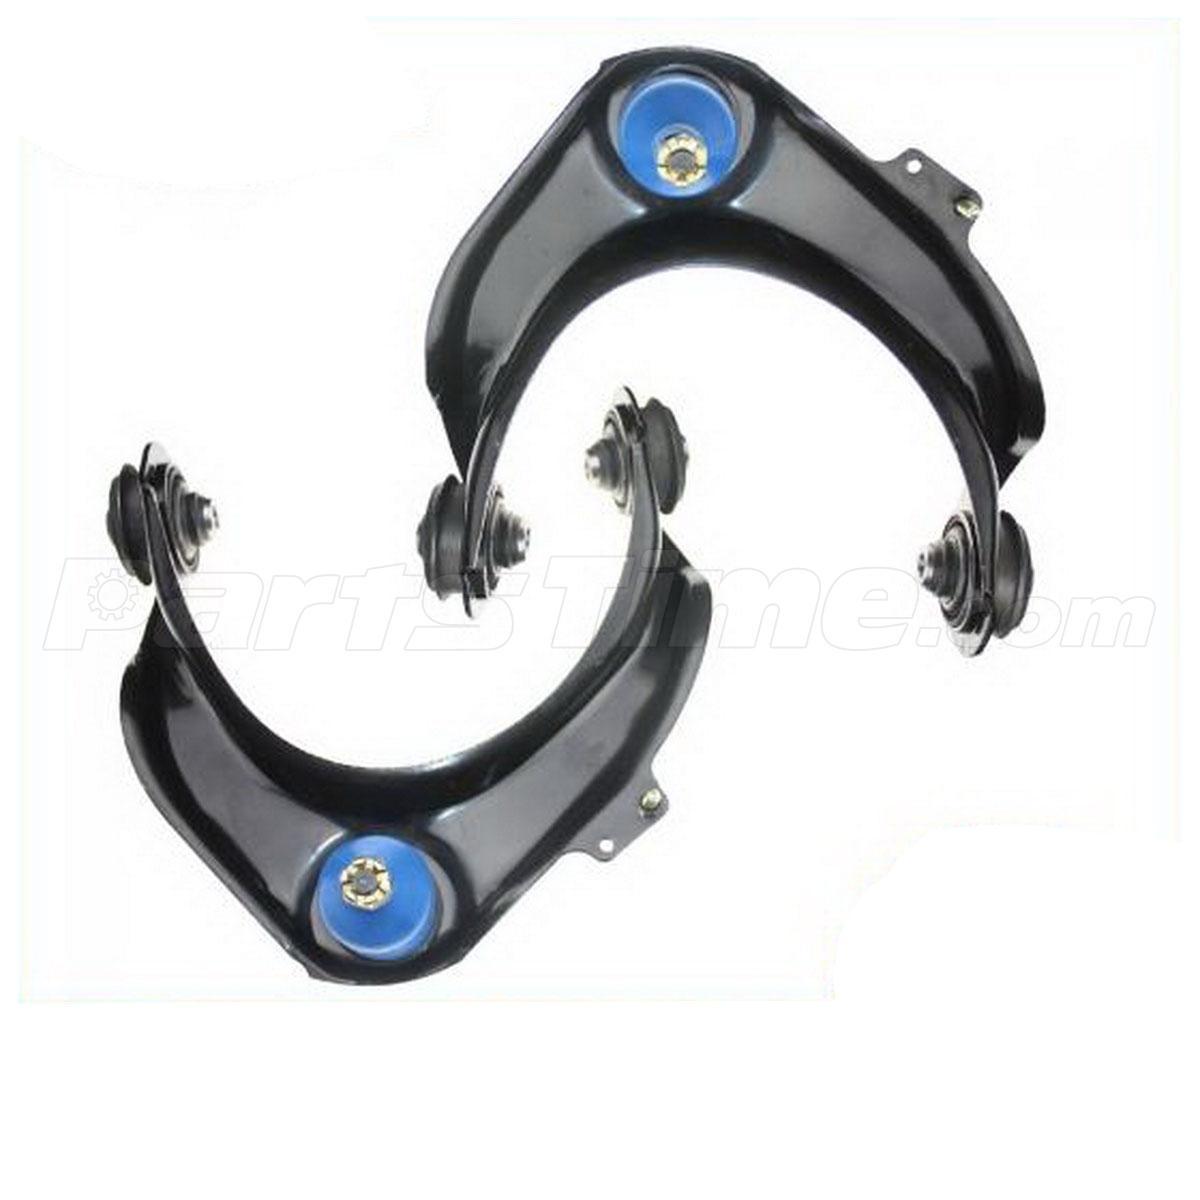 1 pair 2x set front upper control arms for 1998 2002 honda accord 1 yr warranty ebay for 2001 acura cl interior door handle